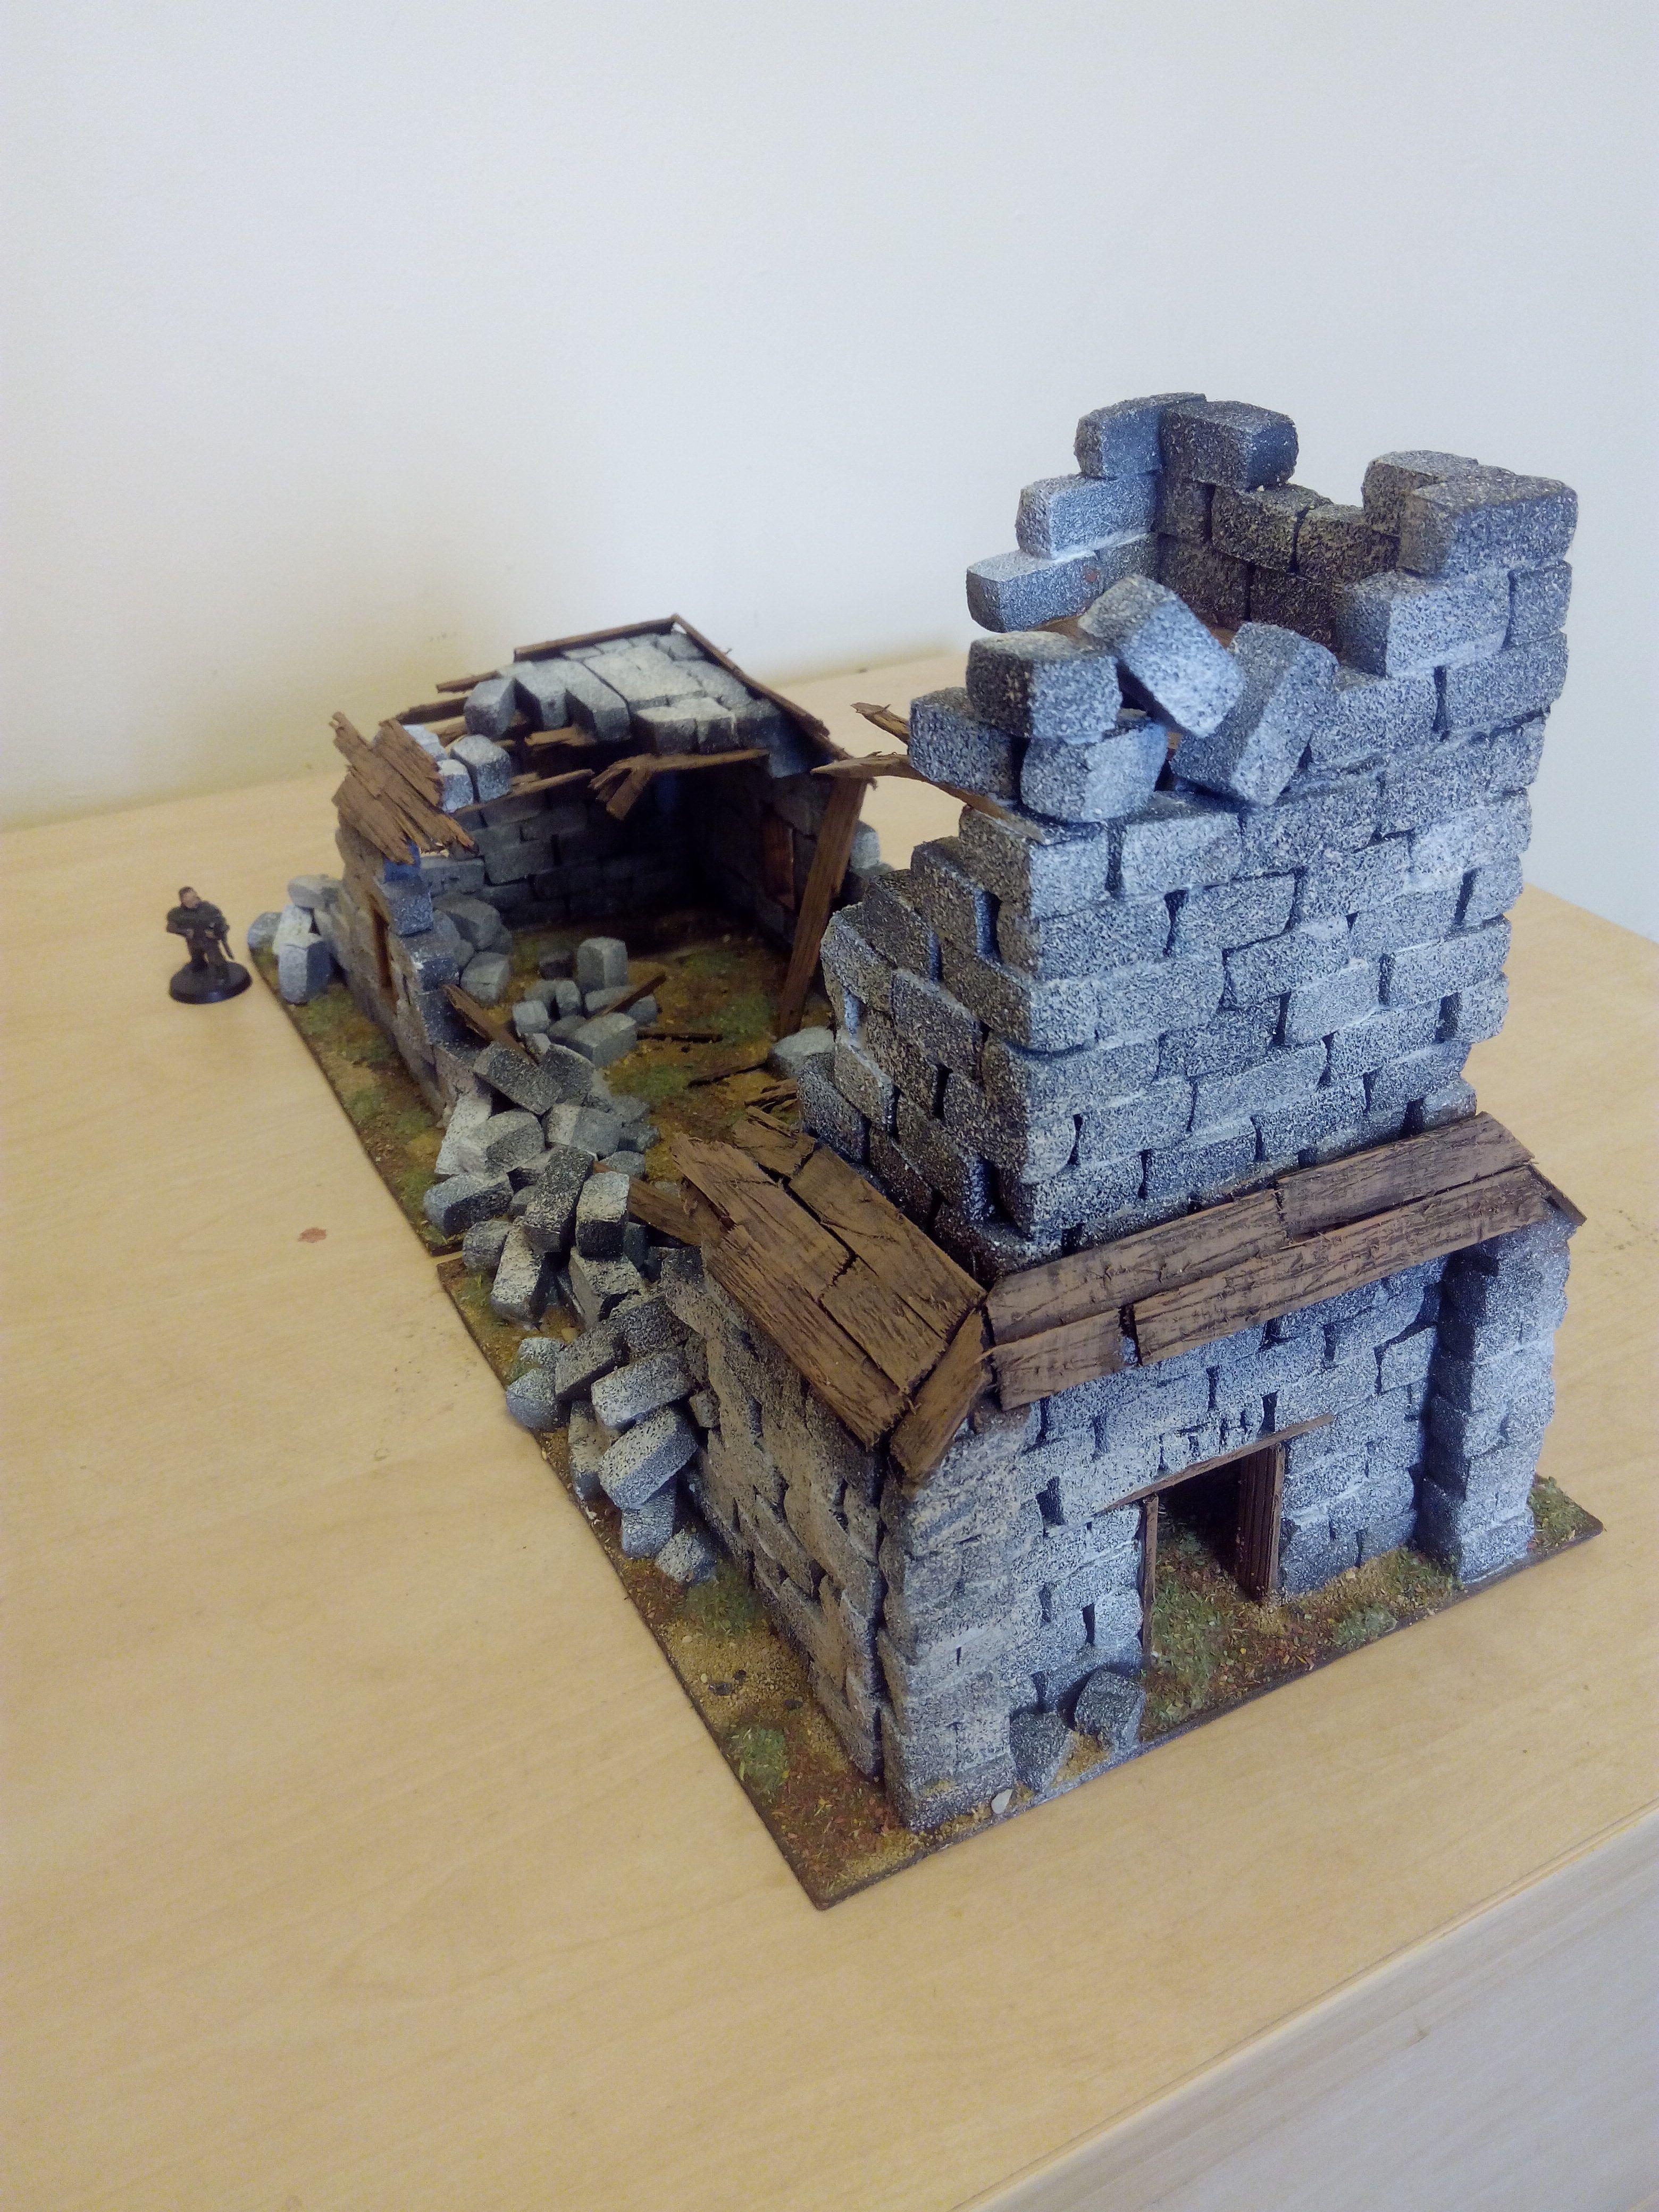 Details about Styrofoam Modelling Bricks - Wargaming Scenery